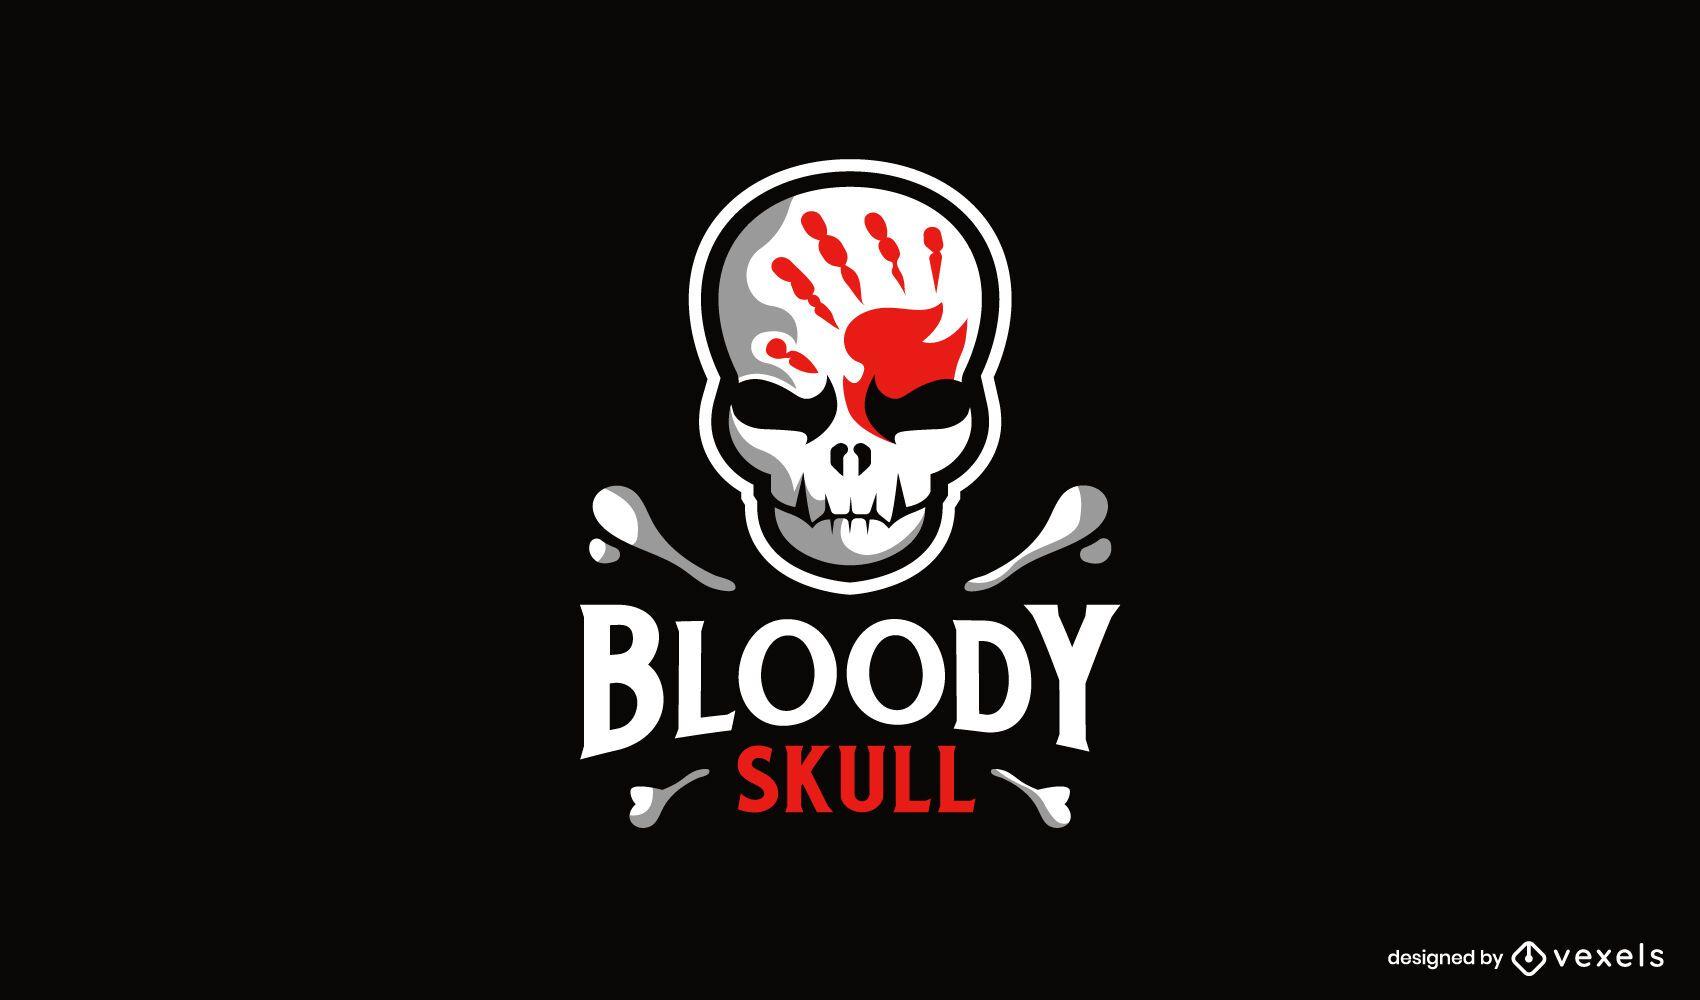 Bloody handprint on skull logo design